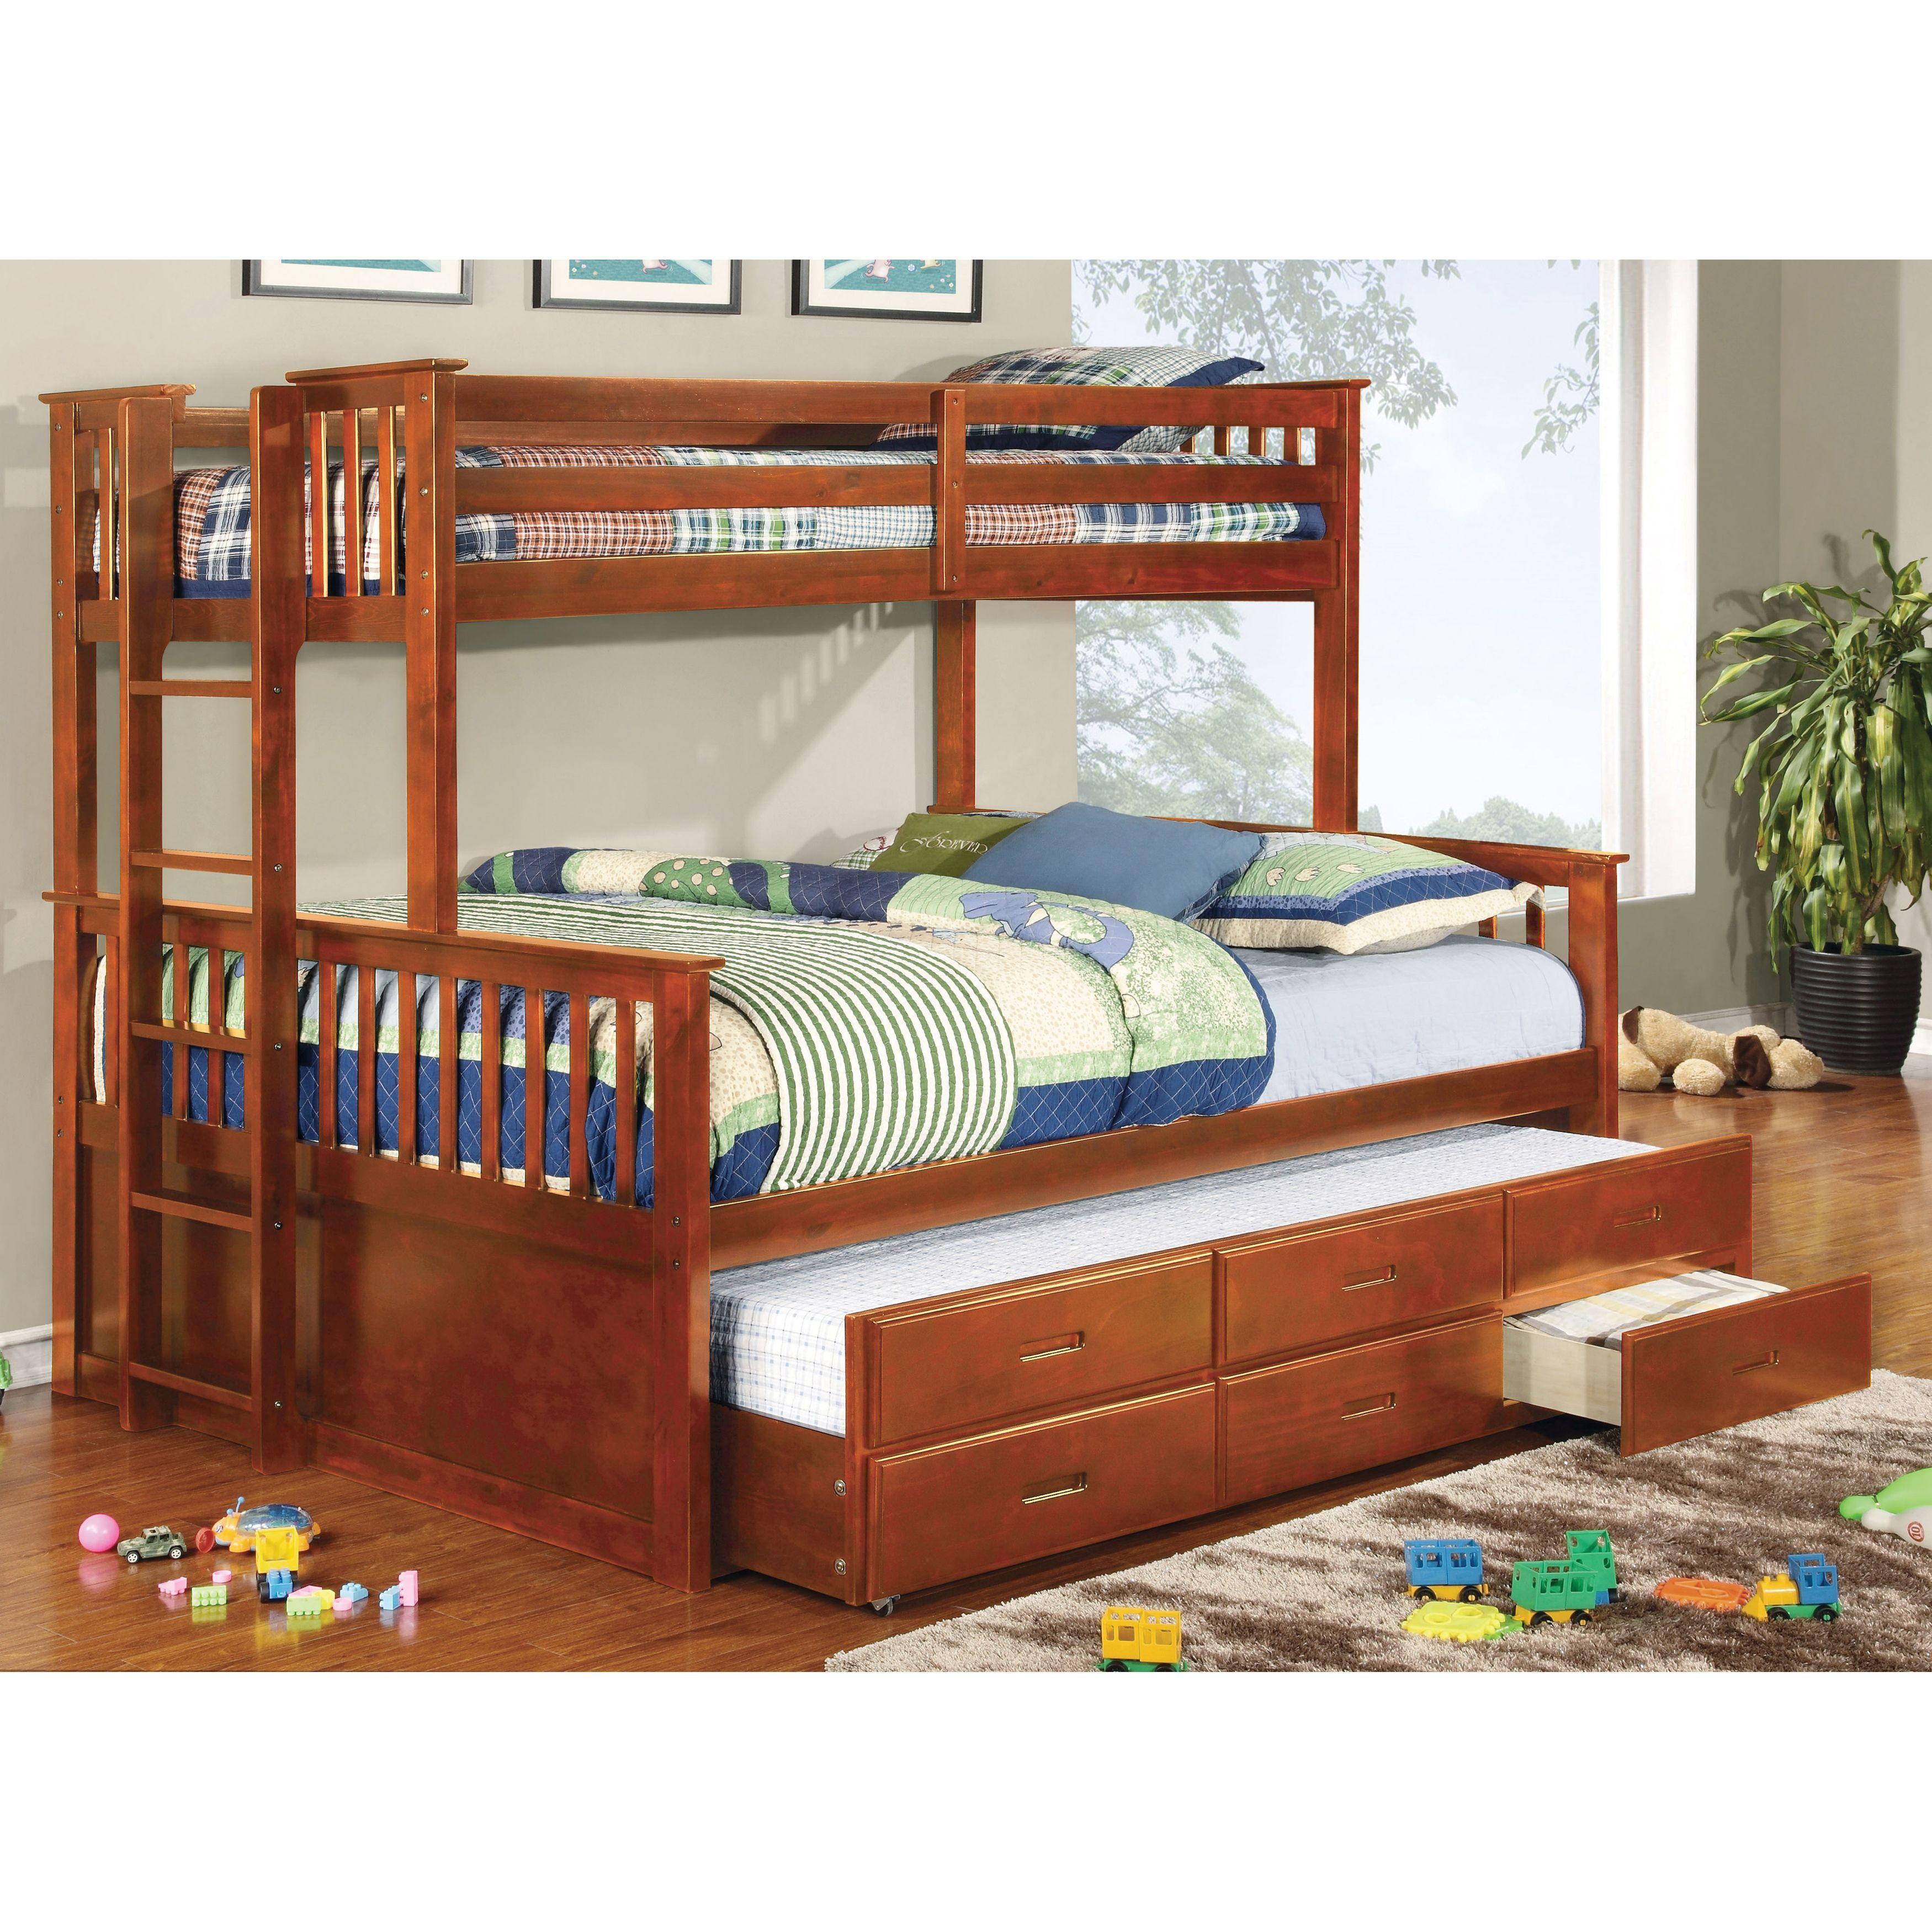 Furniture of America Rodman 2-piece Twin over Queen Bunk Bed Set ...